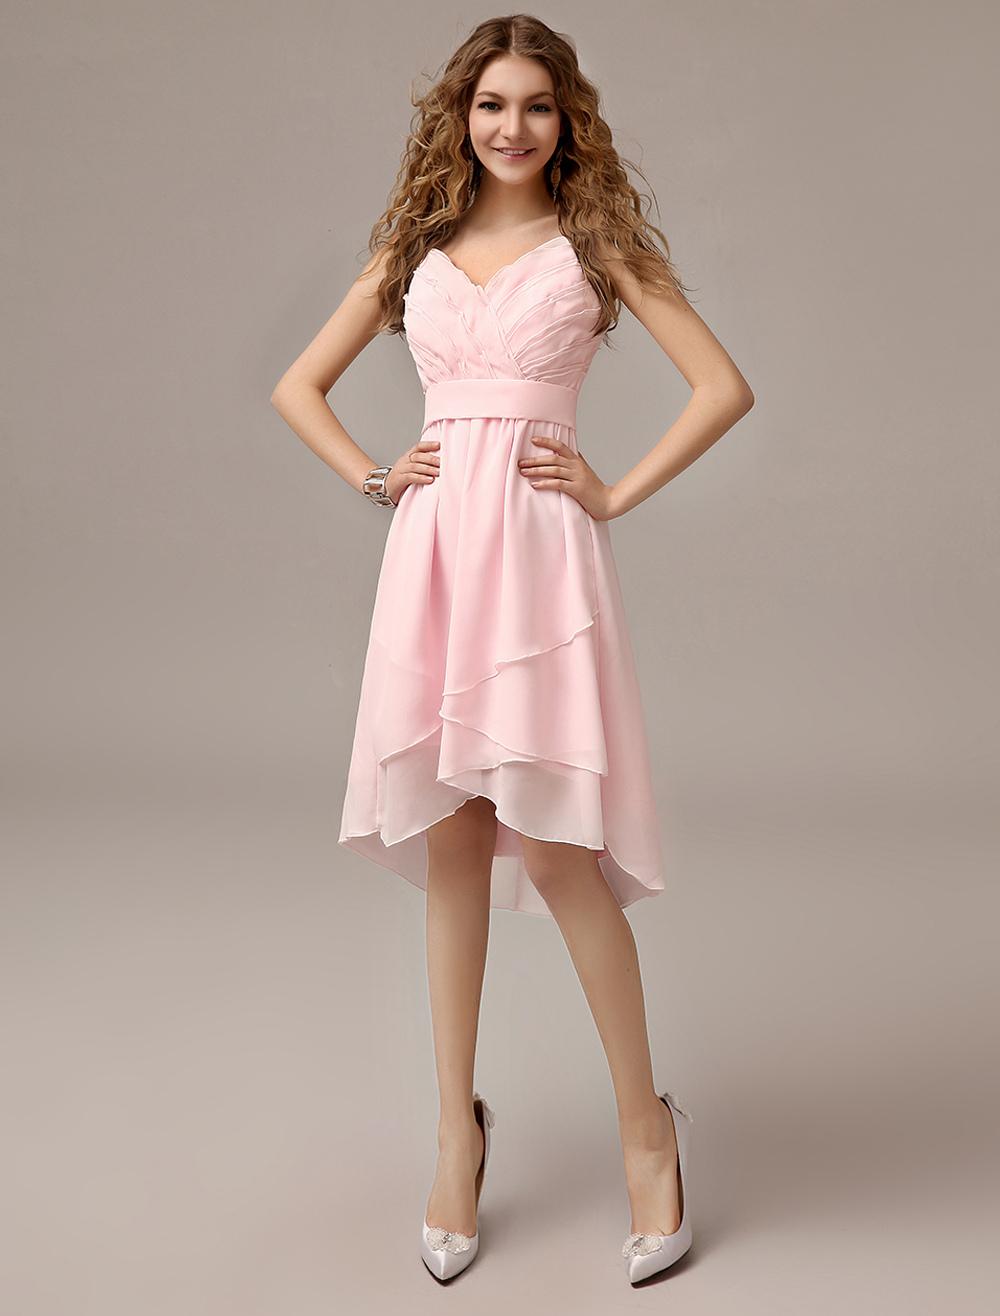 Asymmetrical Blush Pink A-line Ruched Chiffon Bridesmaid Dress With Straps Neck (Wedding Bridesmaid Dresses) photo